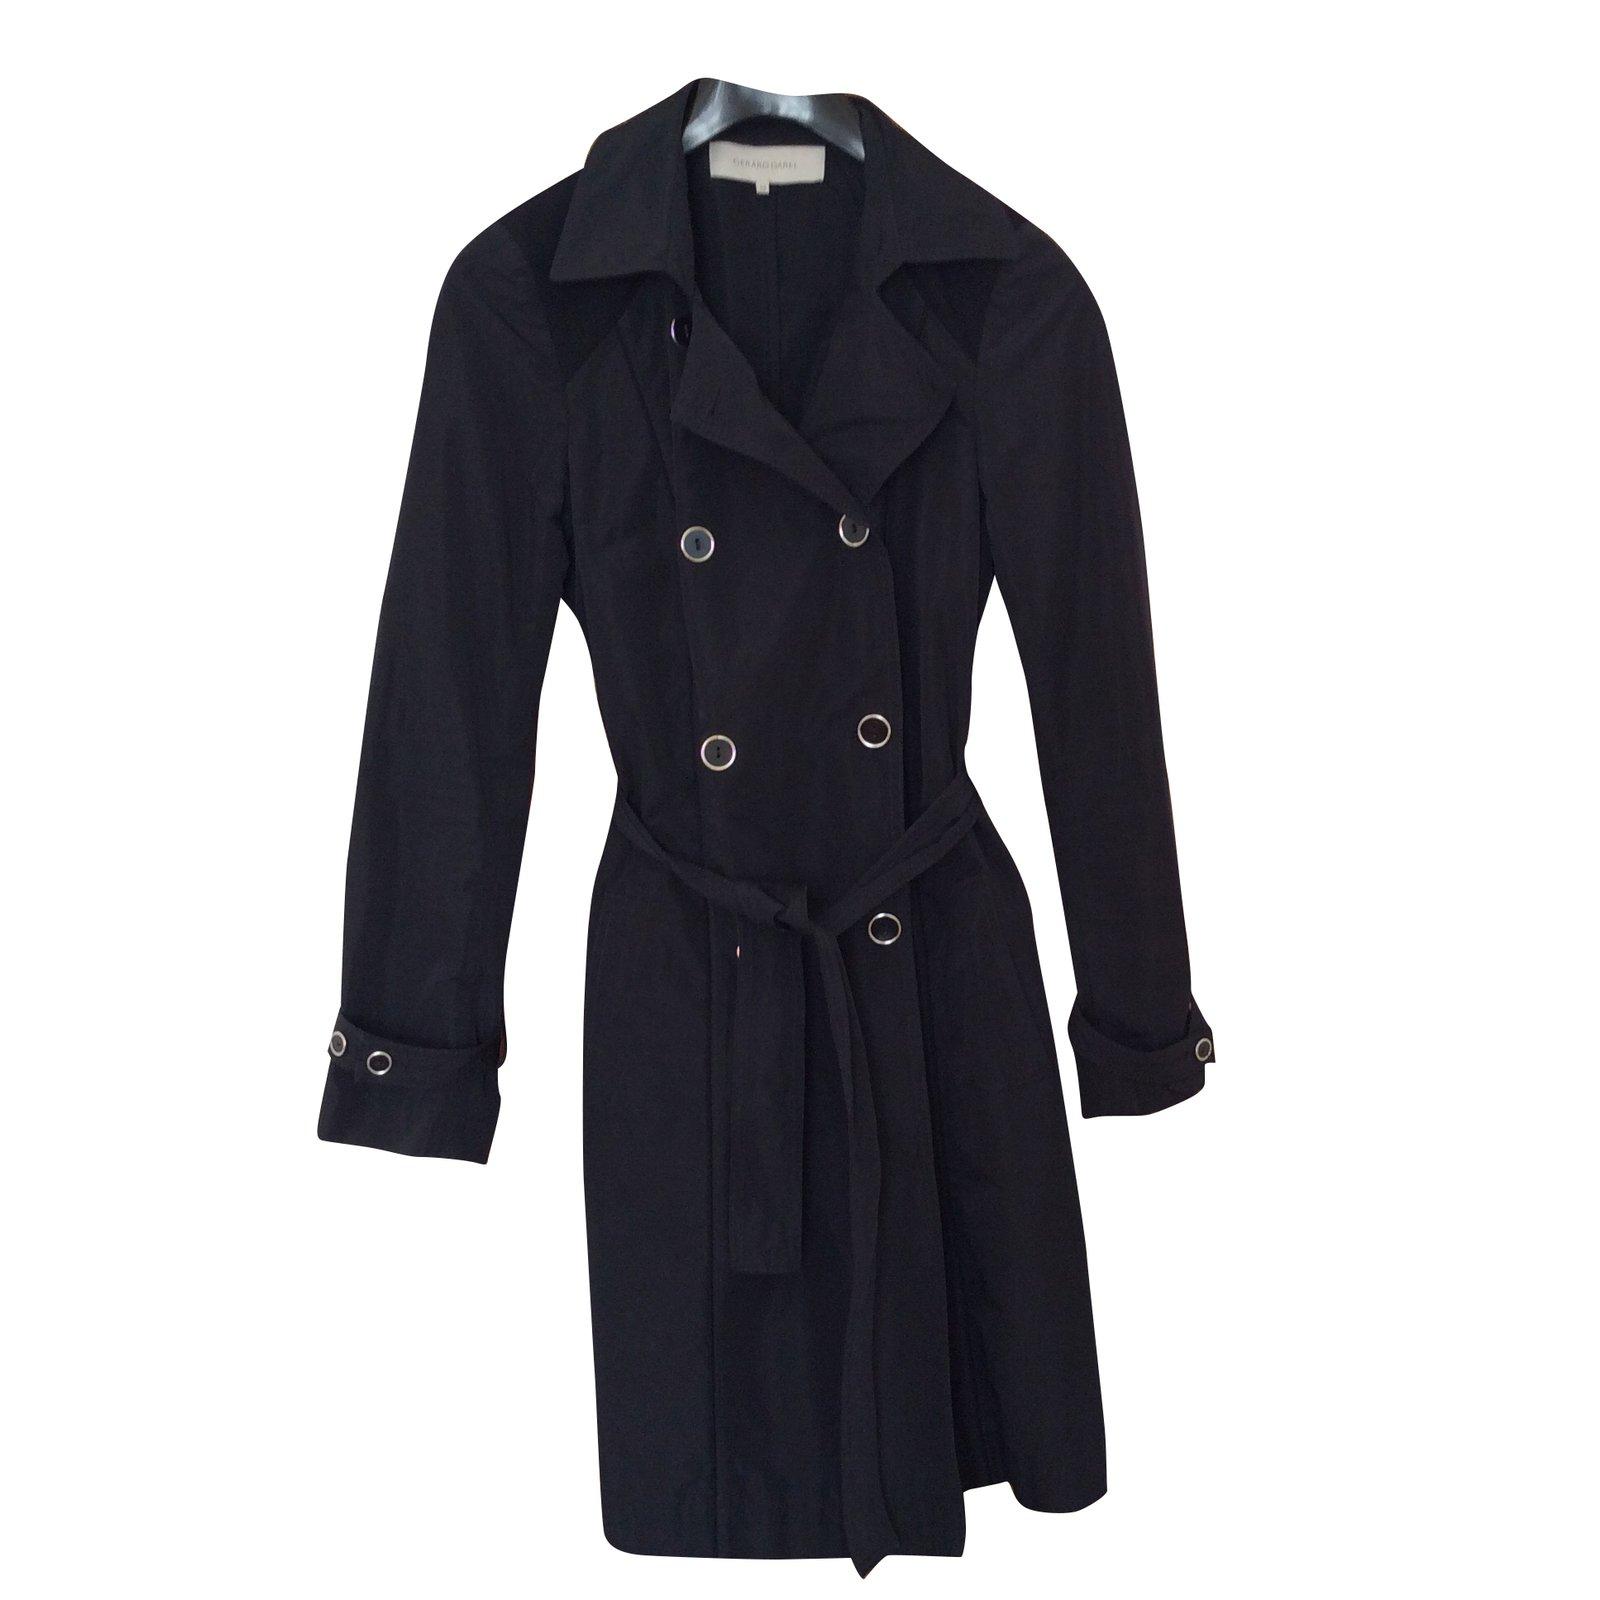 Manteau noir femme gerard darel